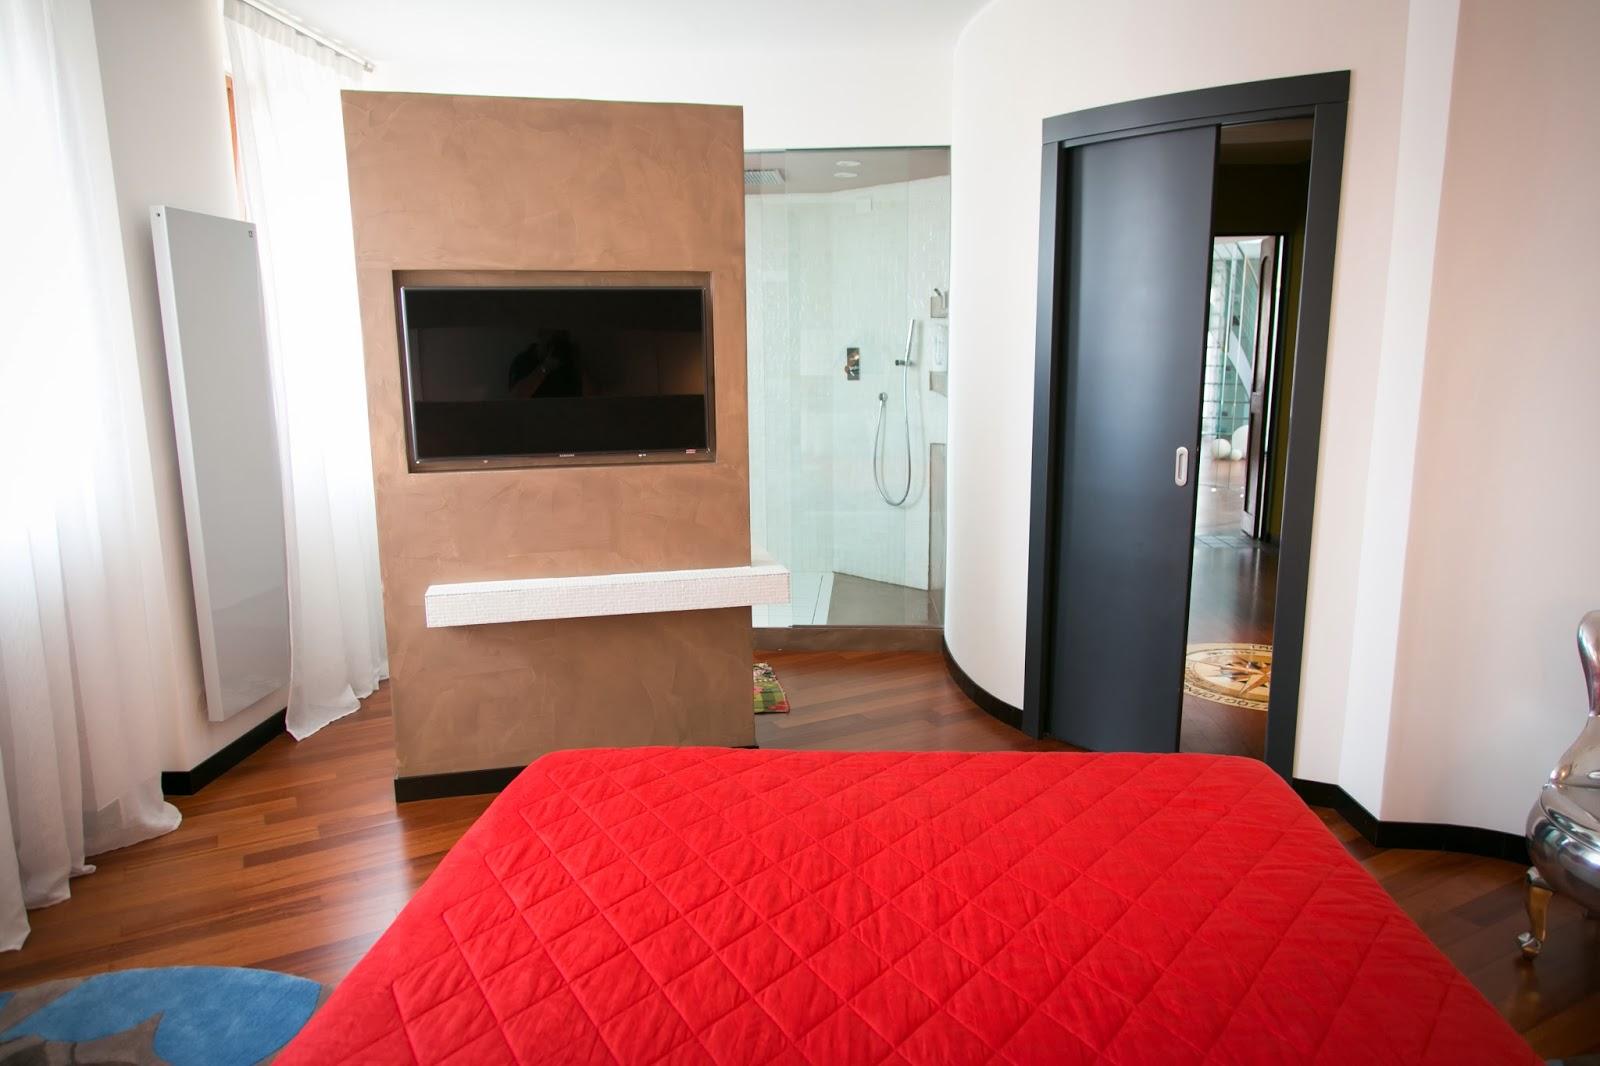 Muri divisori interni - Camera nascosta in bagno ...